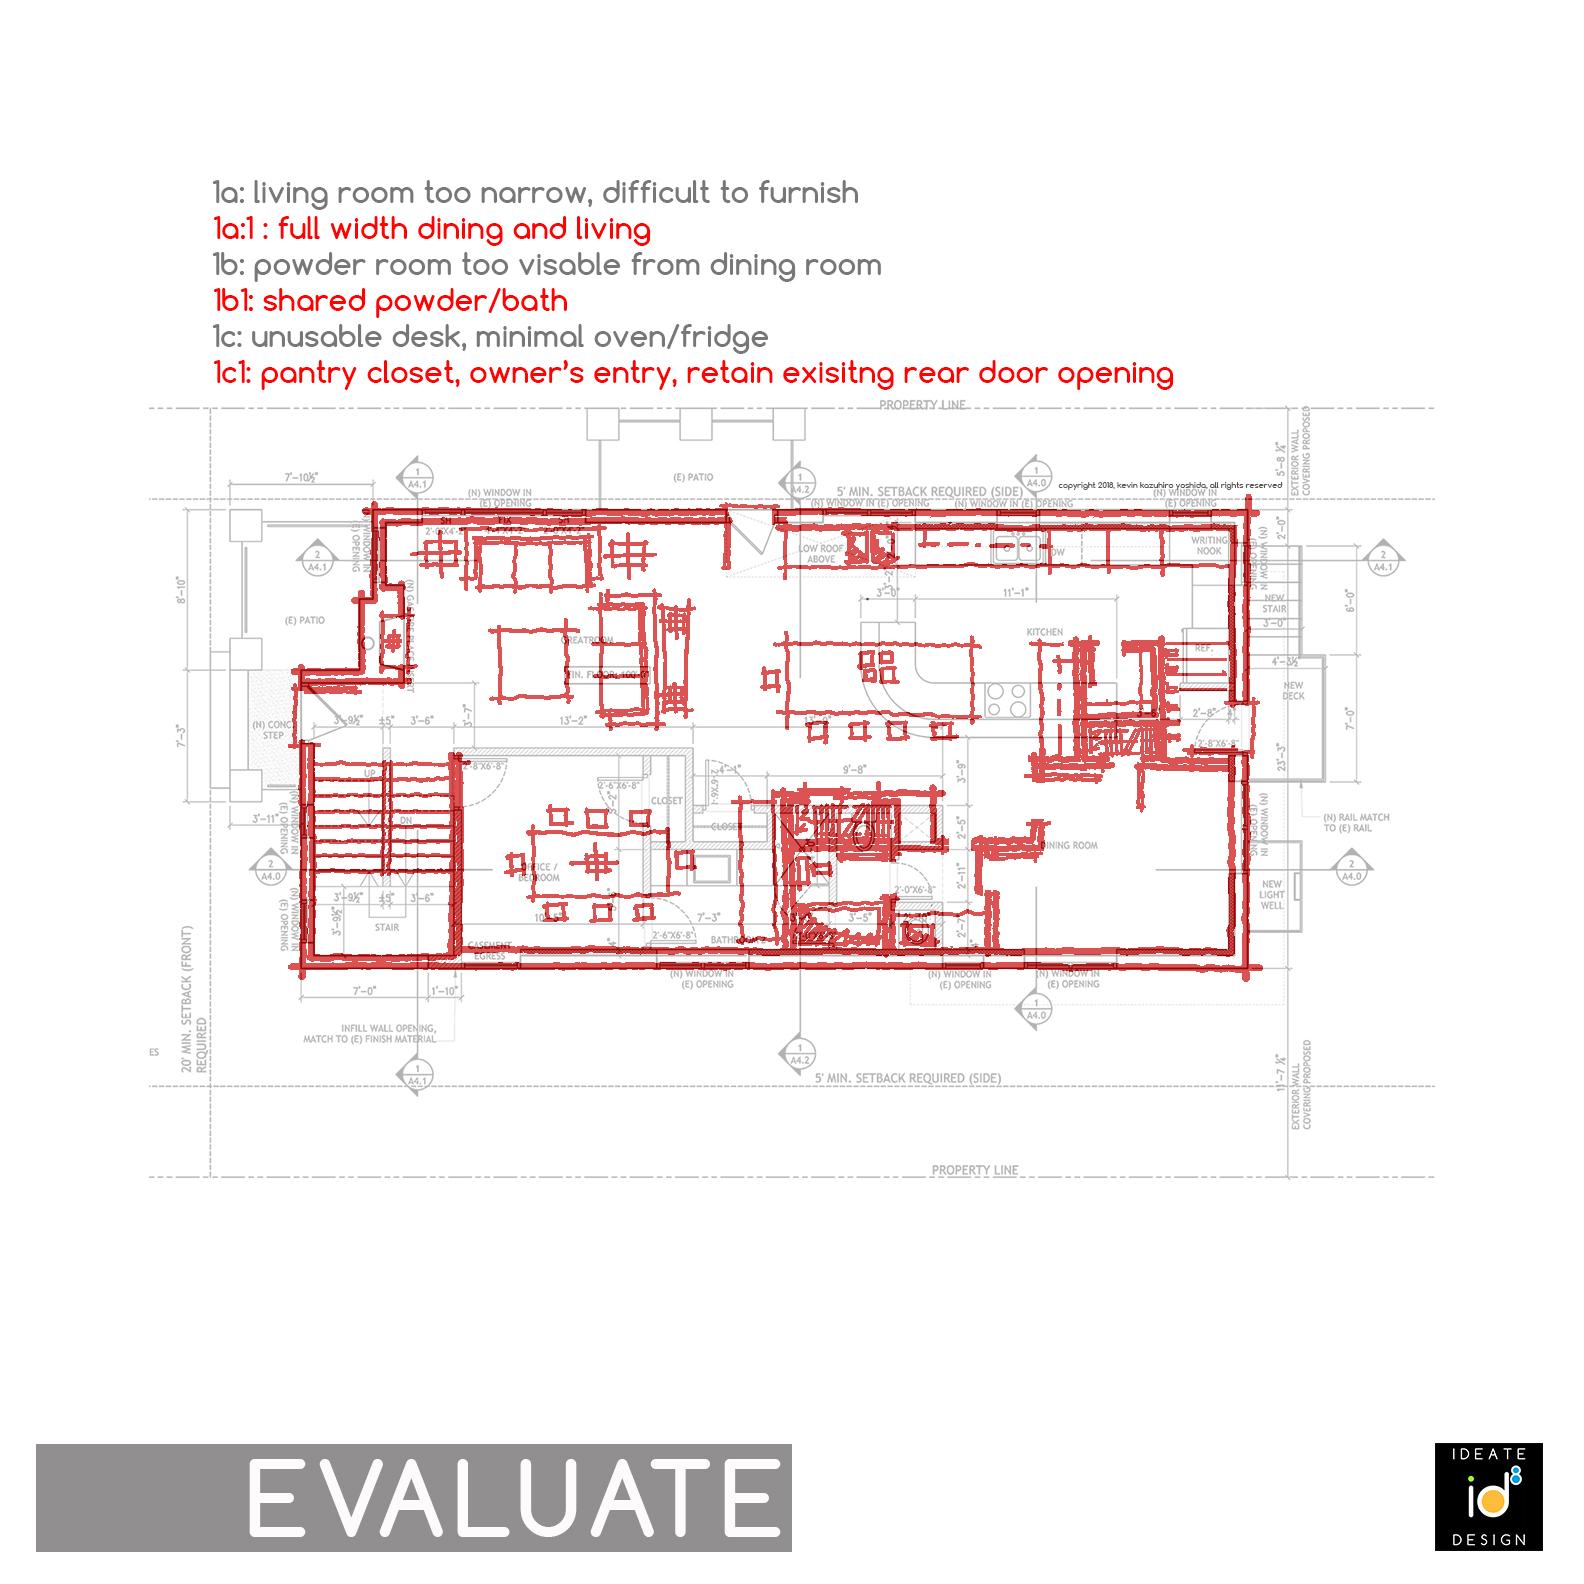 2018_12dec12 400sgaylord evaluate.jpg